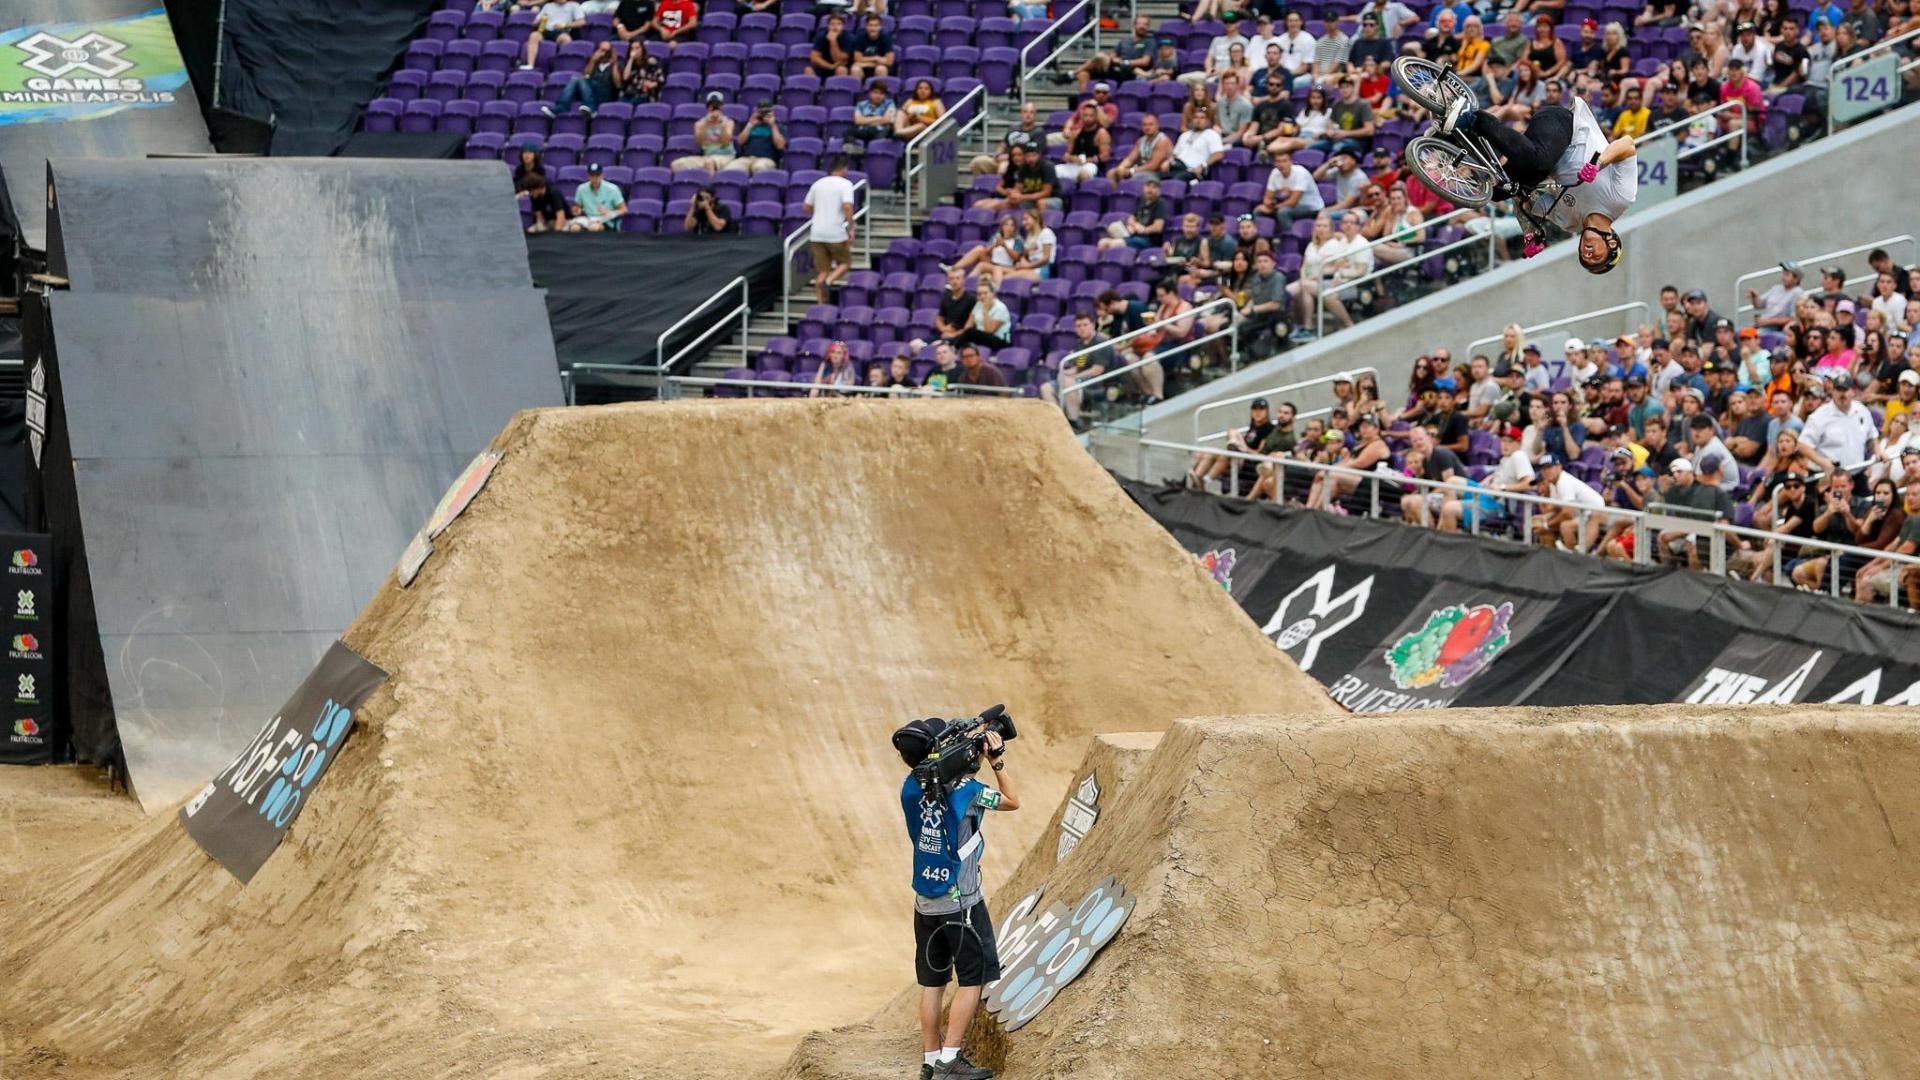 Brandon Loupos wins X Games BMX Dirt gold